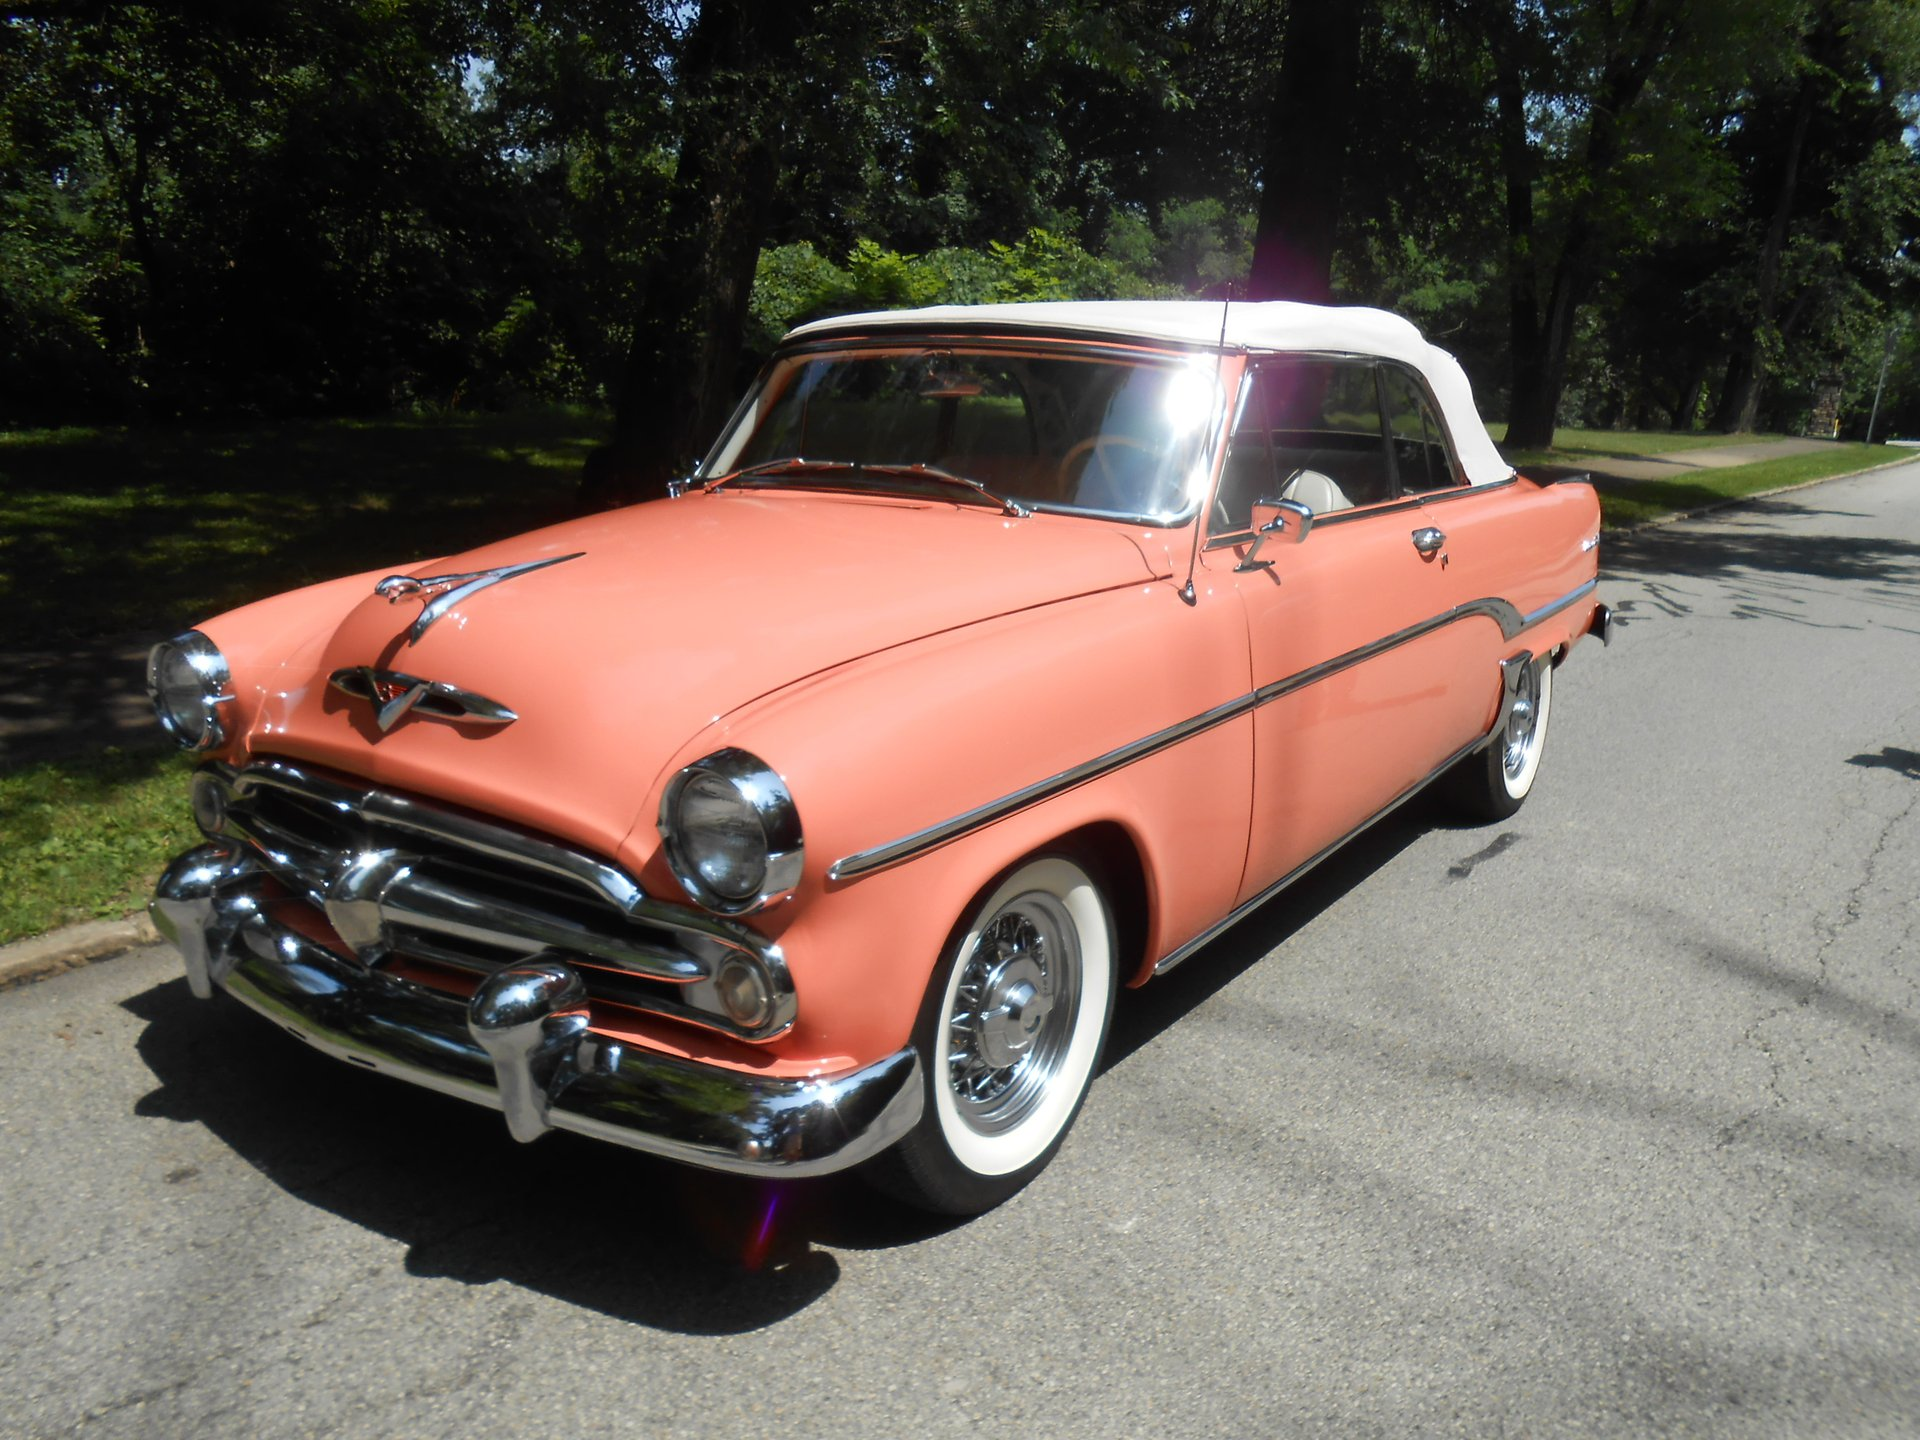 1954 dodge royal powerflite convertible